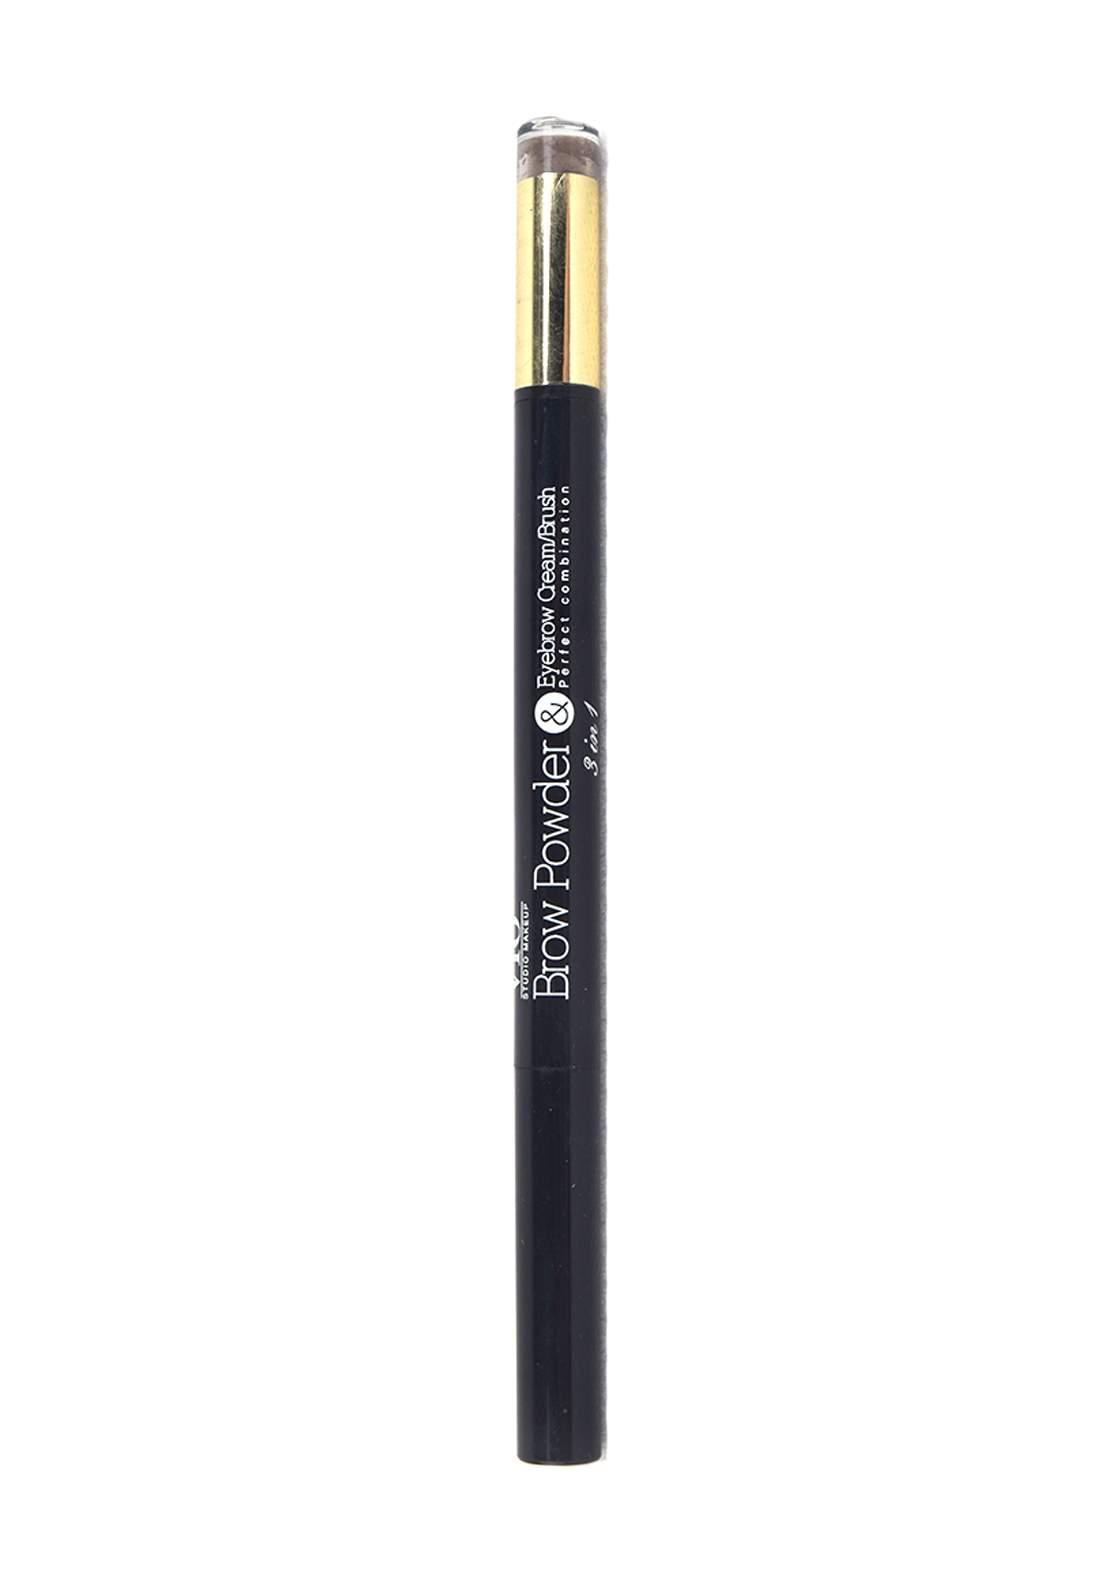 Vio Studio Makeup 3 in 1 Brow Powder , Eyrbrow Cream and Brush No.02 باودر حواجب